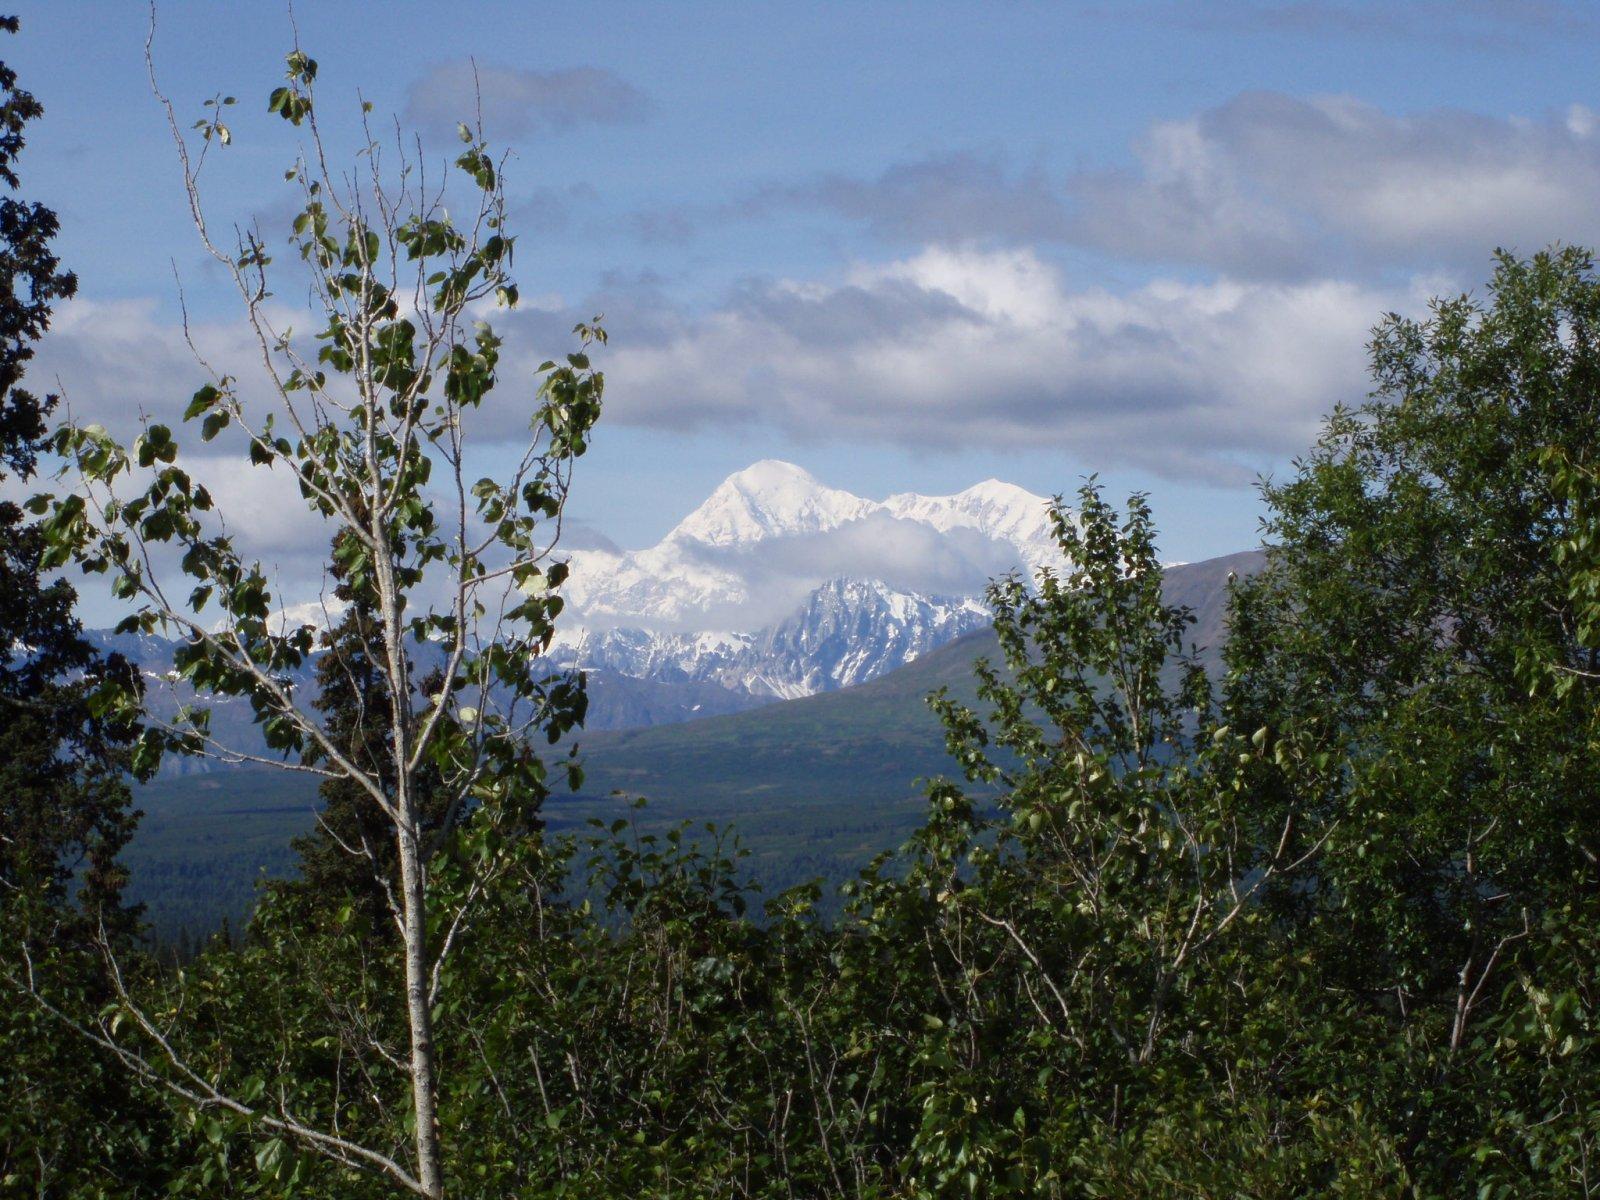 Click image for larger version  Name:Alaska August 08 290.jpg Views:95 Size:394.3 KB ID:101794